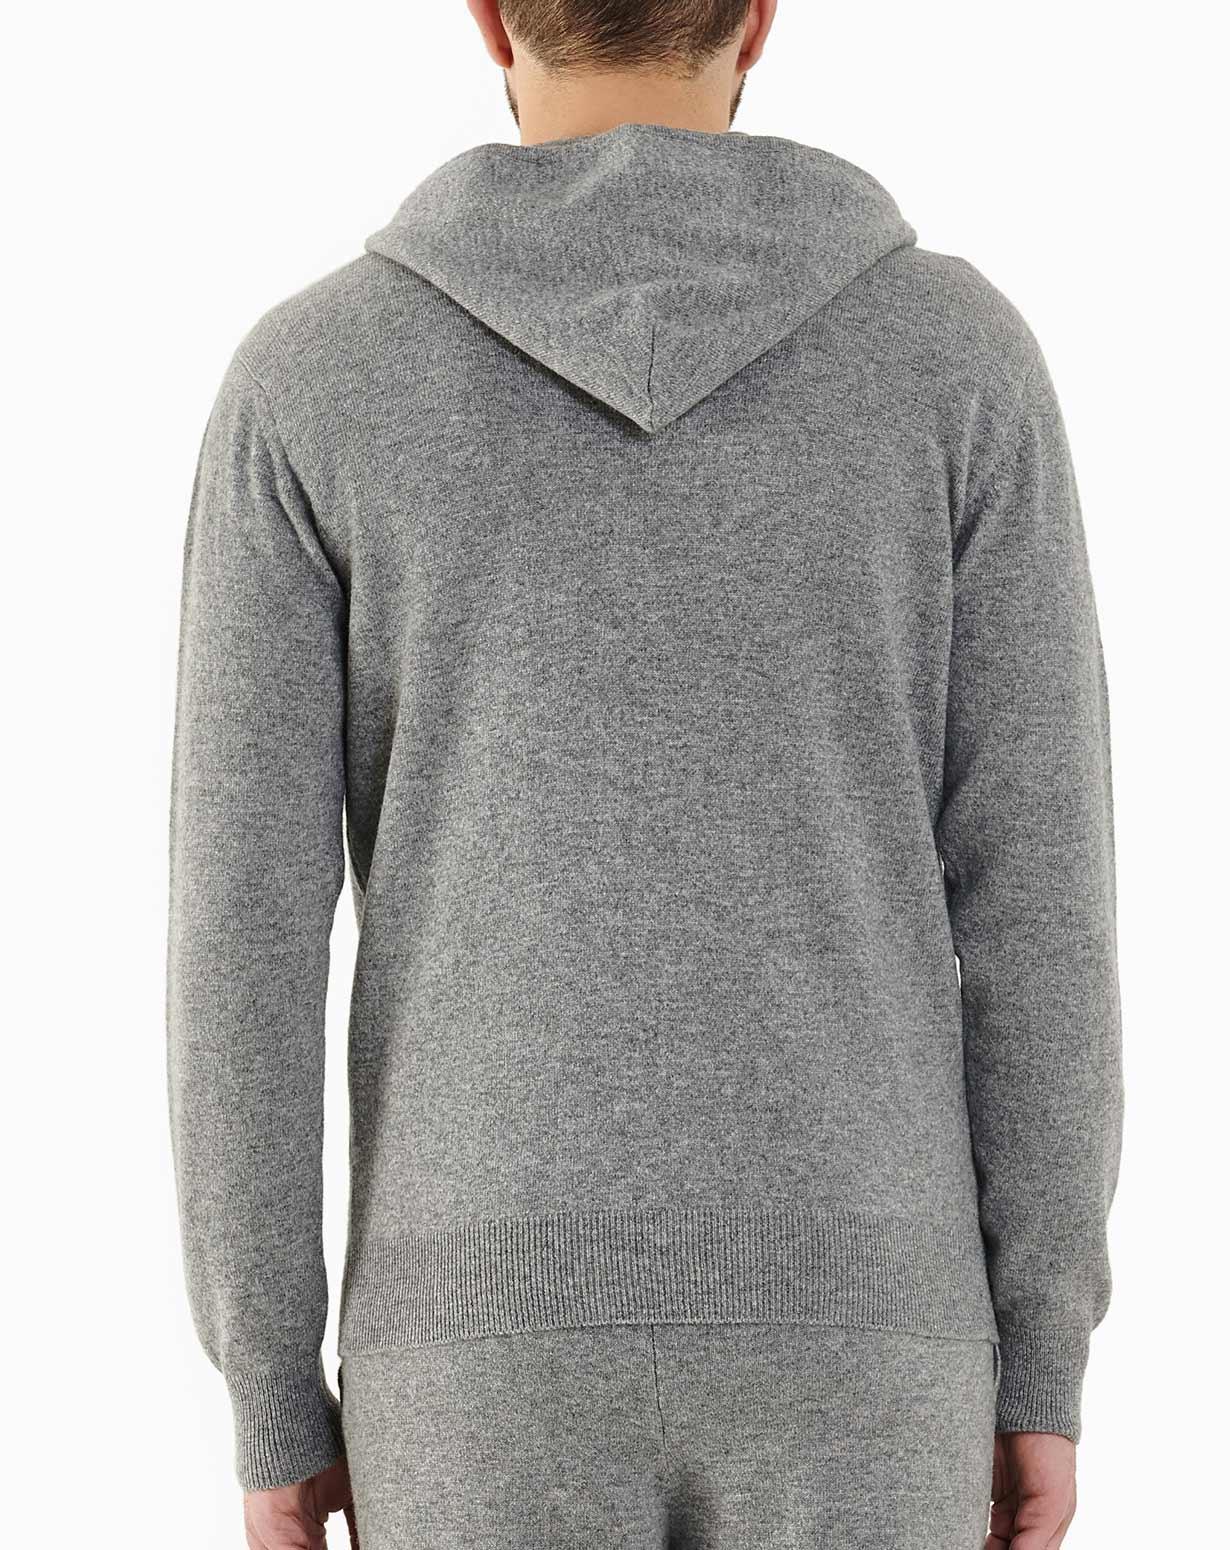 Men S Cashmere Hoodie Sweater Maisoncashmere